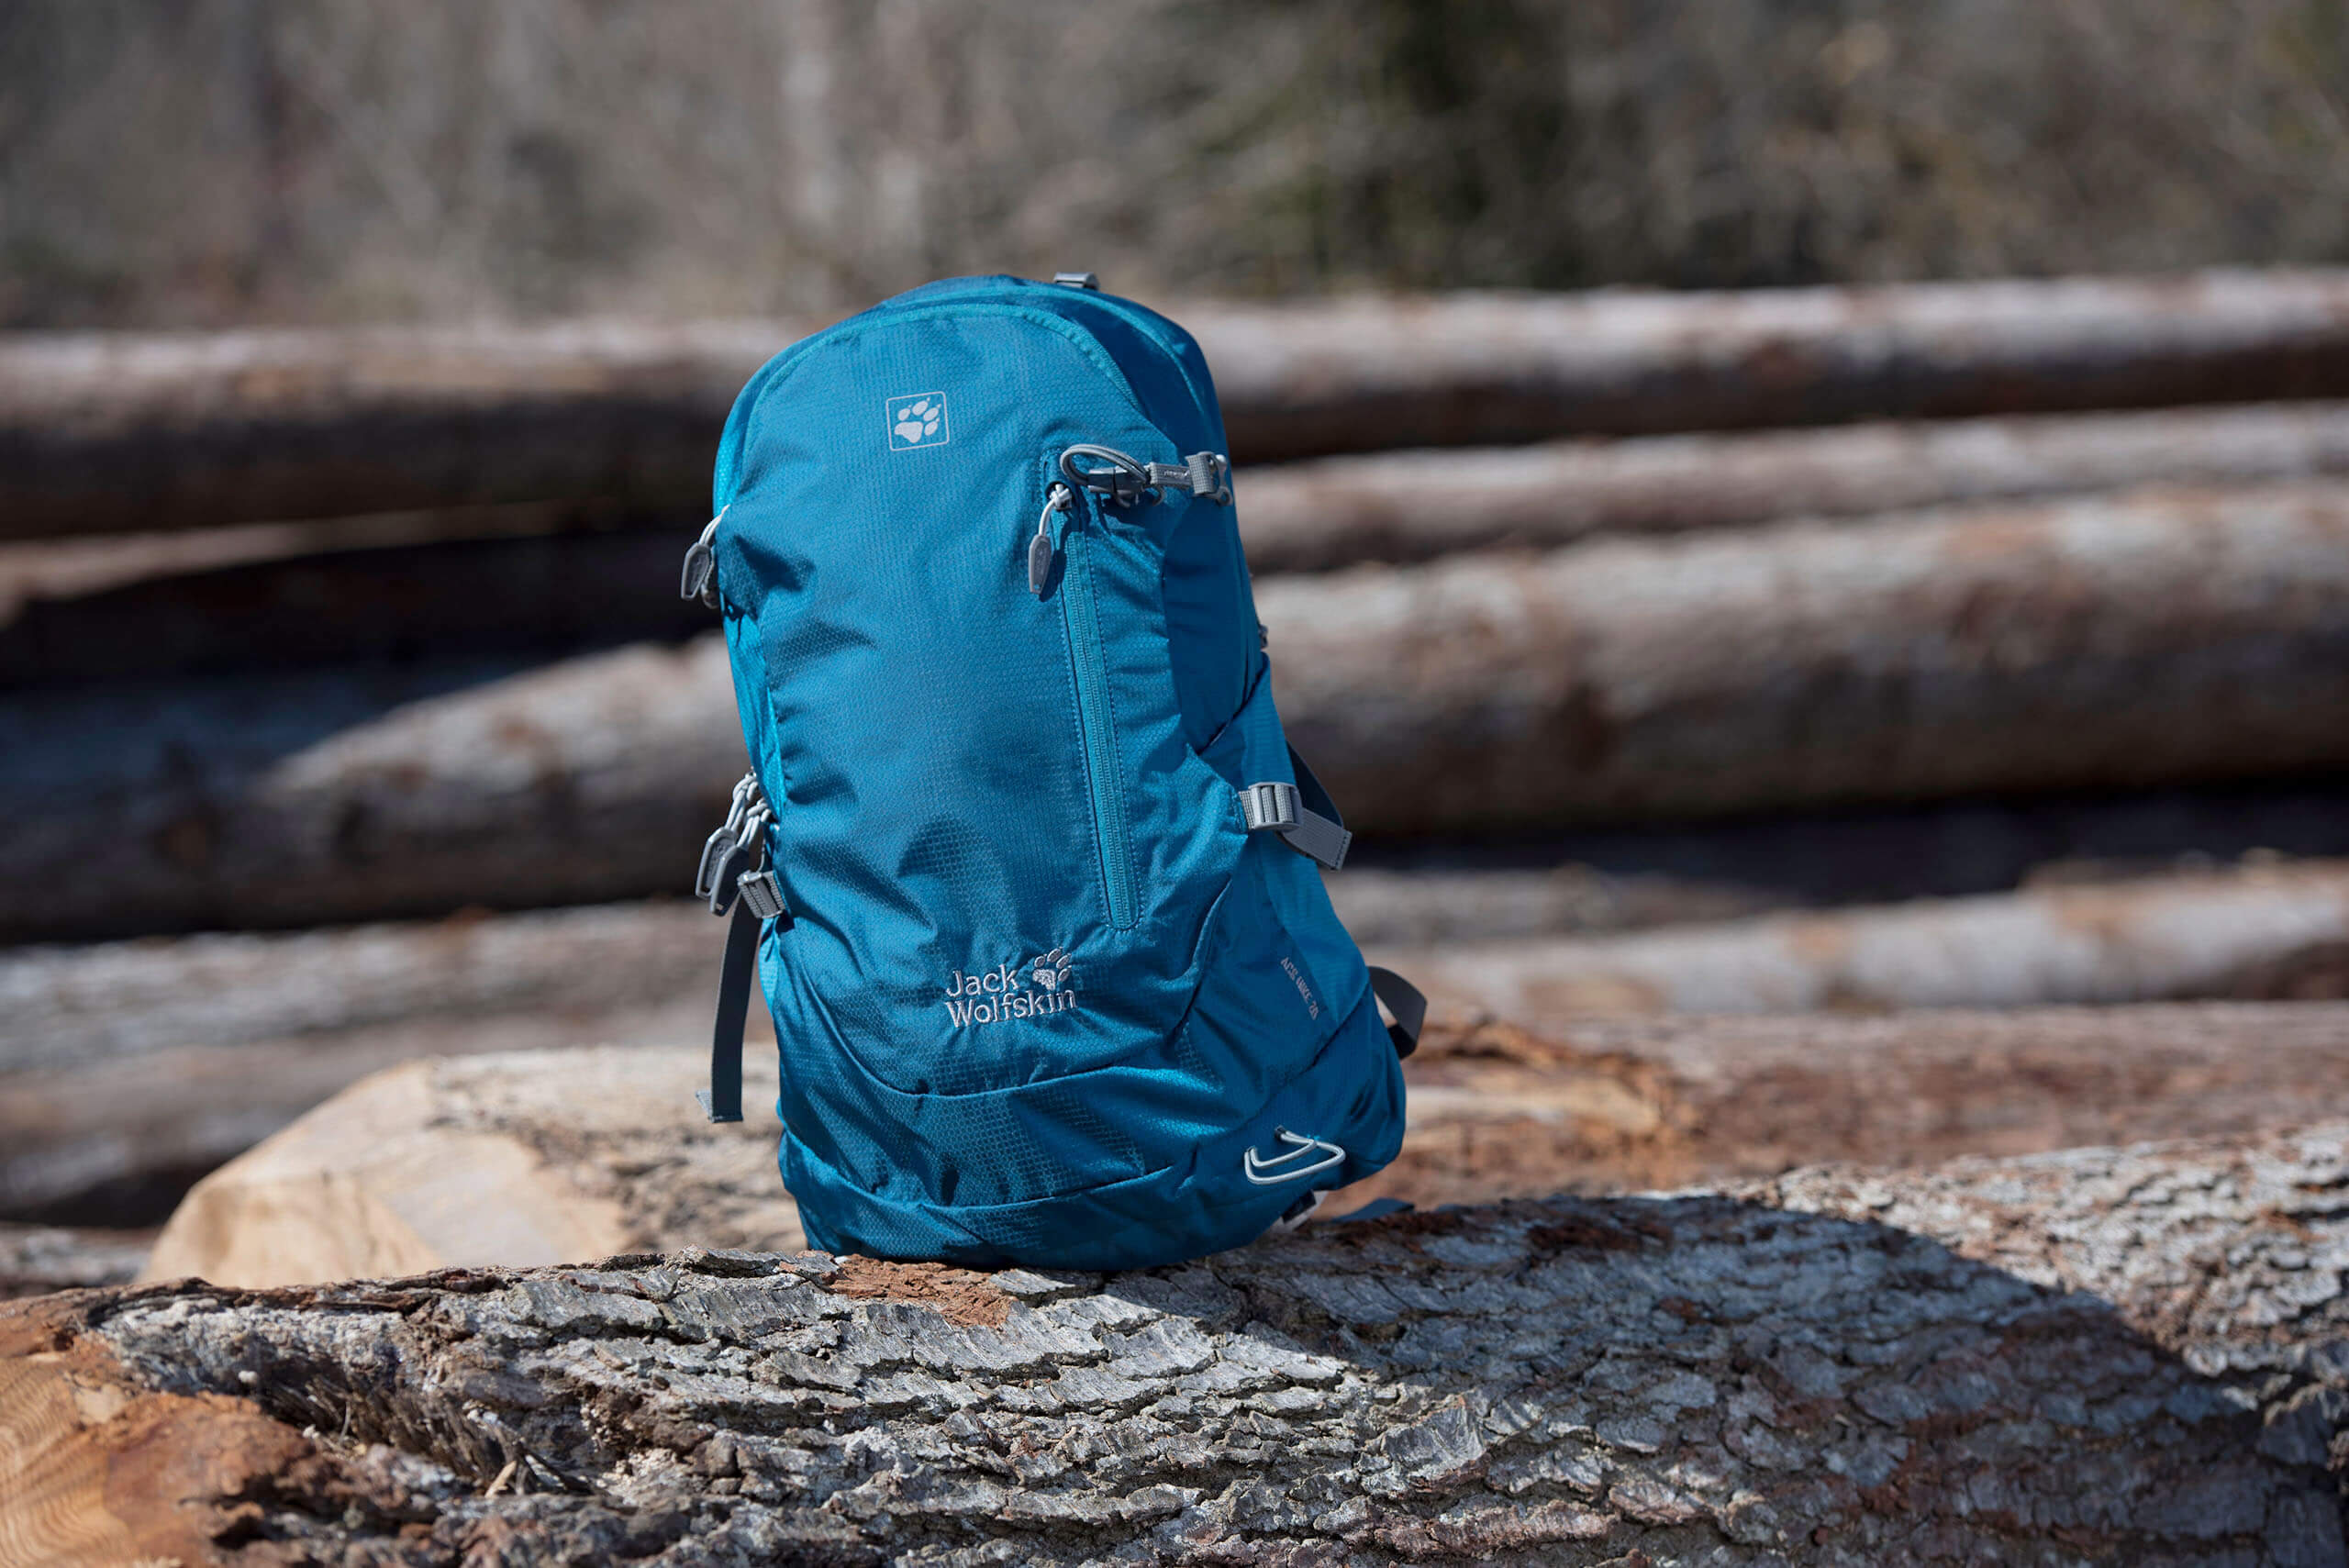 travelbags product fotografie locatiefotografie